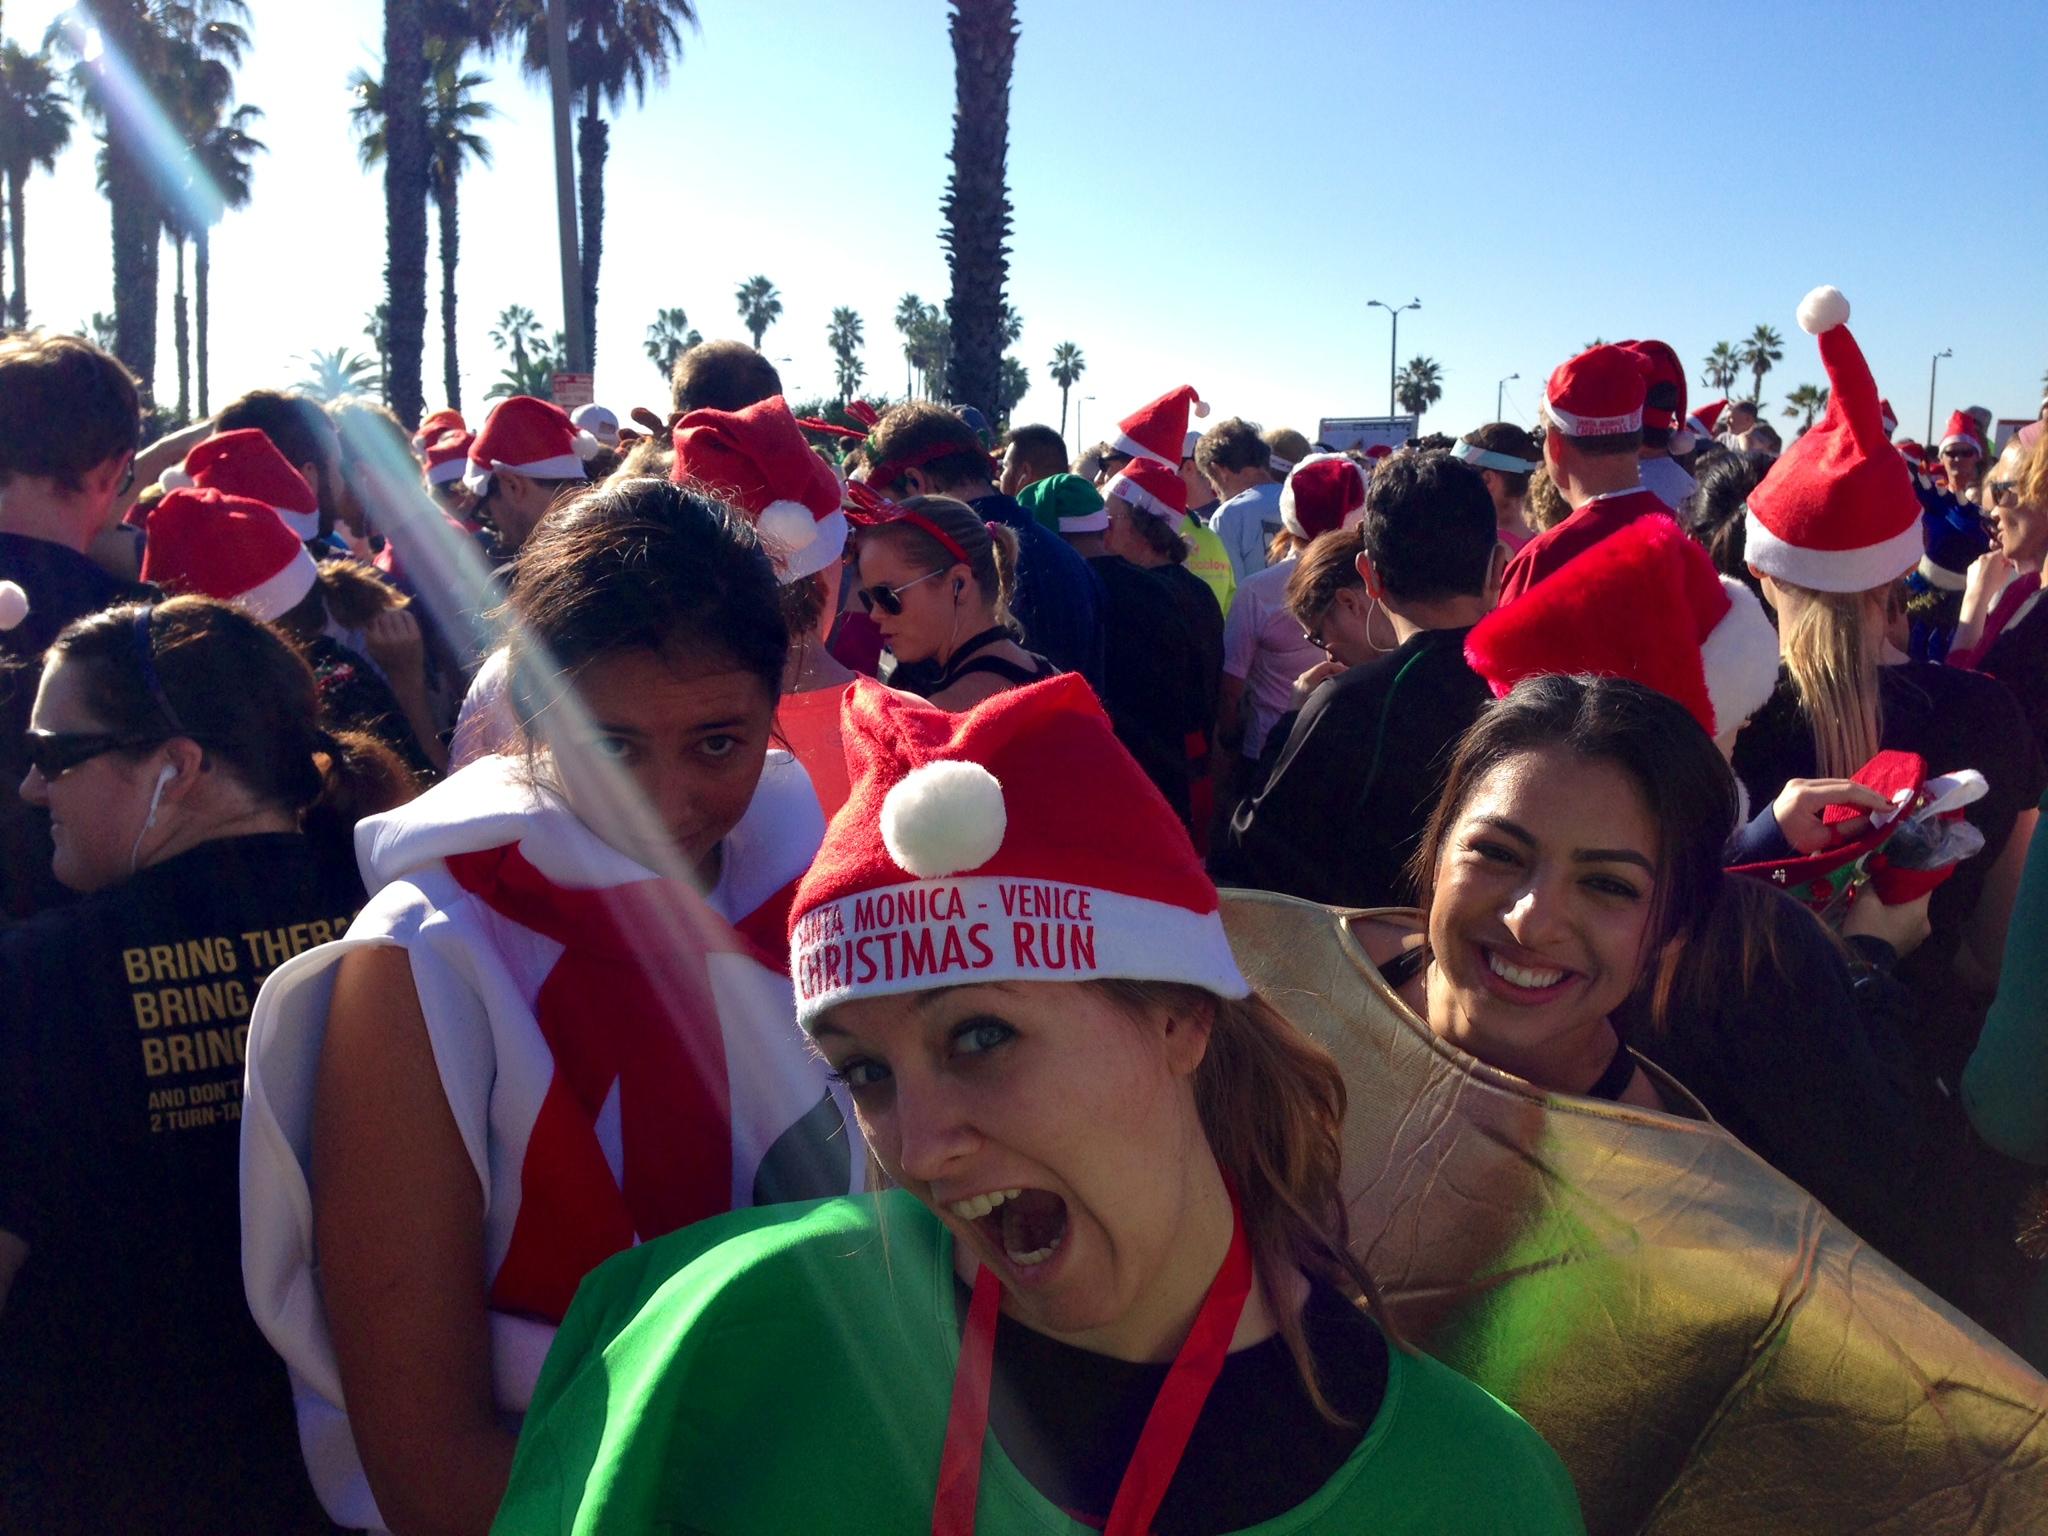 Santa-Monica Venice Christmas Run 10K and 5K Race Review | The ...